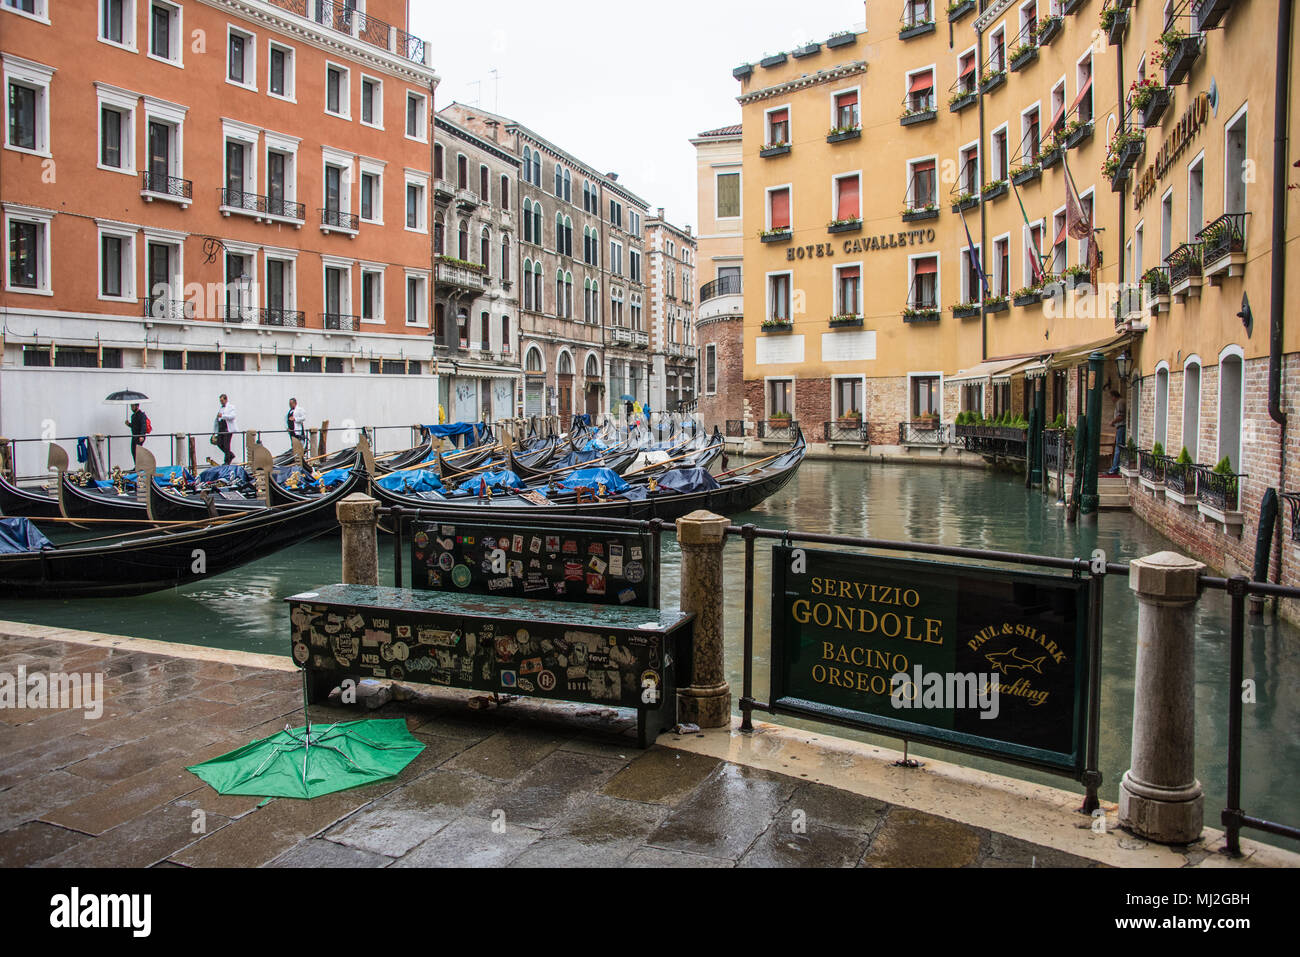 Gondolas moored in Bacino Orseolo in front of the  Hotel Cavalletto, Venice - Stock Image